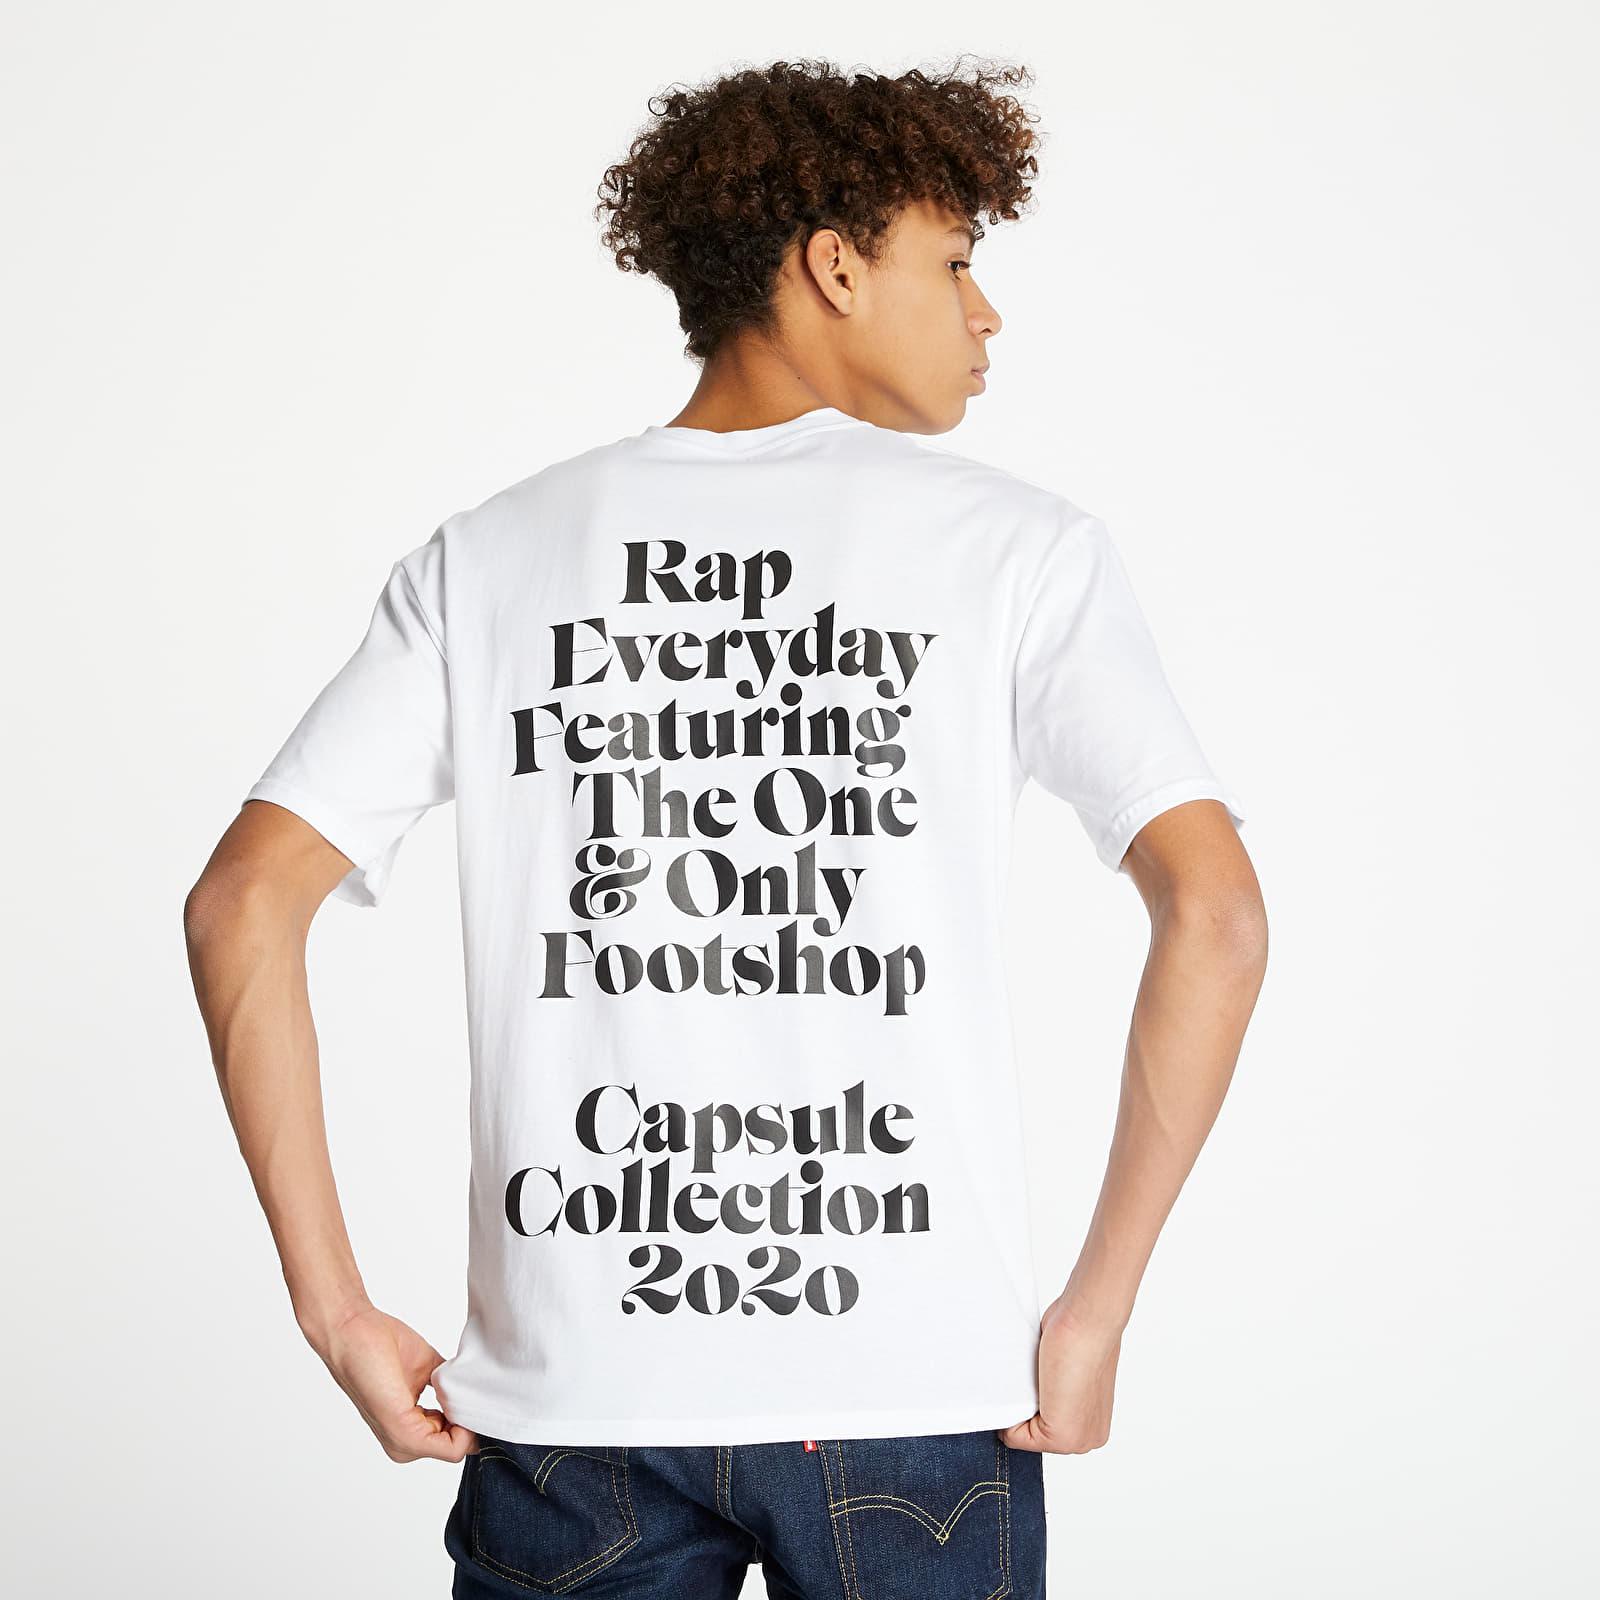 Trička RAP x Footshop Definition Tee White